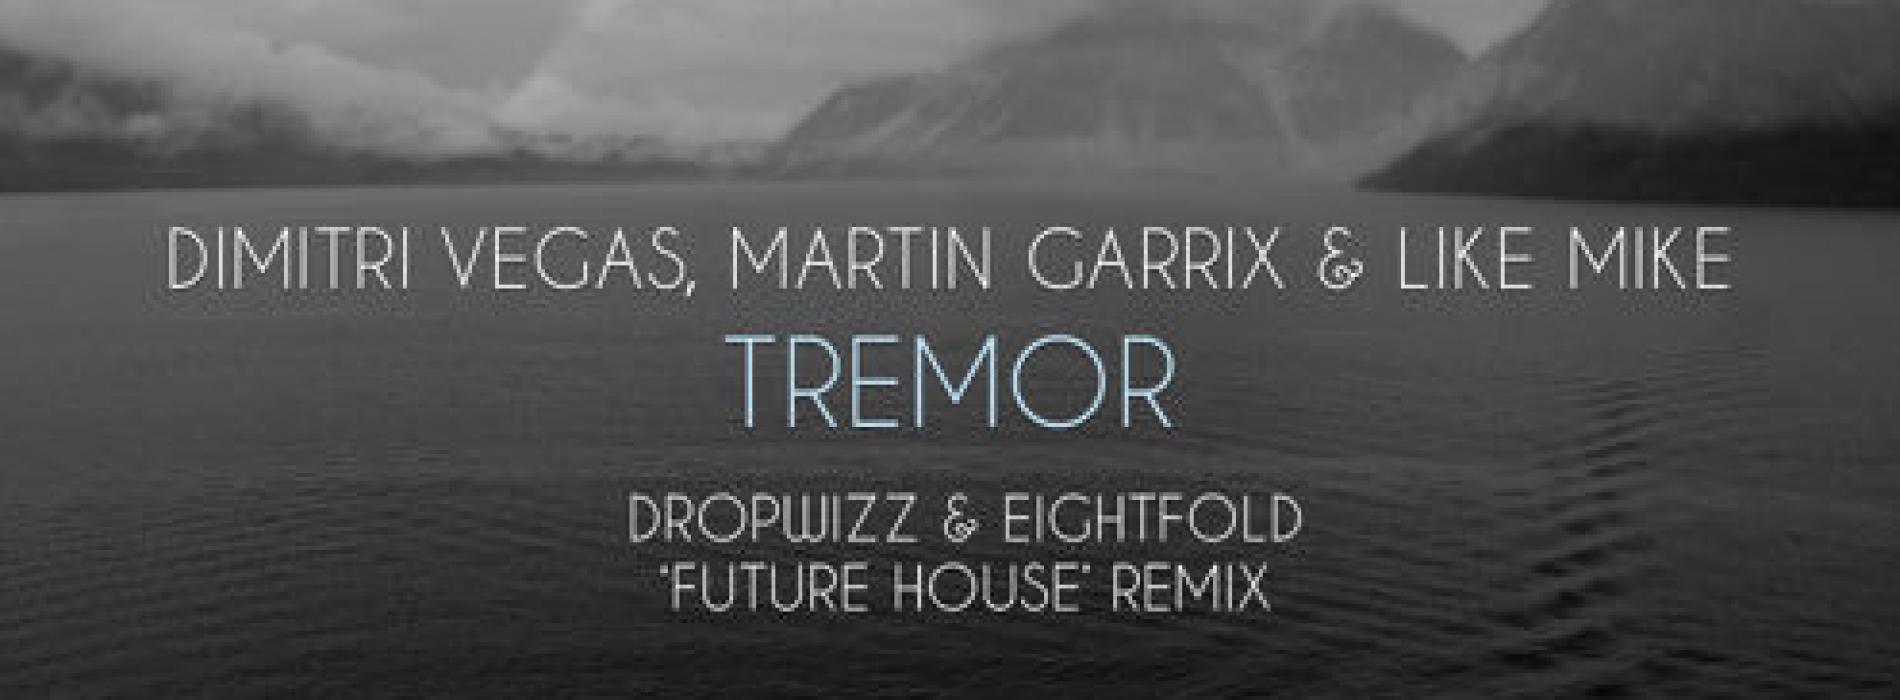 Dropwizz & Eightfold – DV, Martin Garrix & LM – Tremor ('Futcha House' Remix)